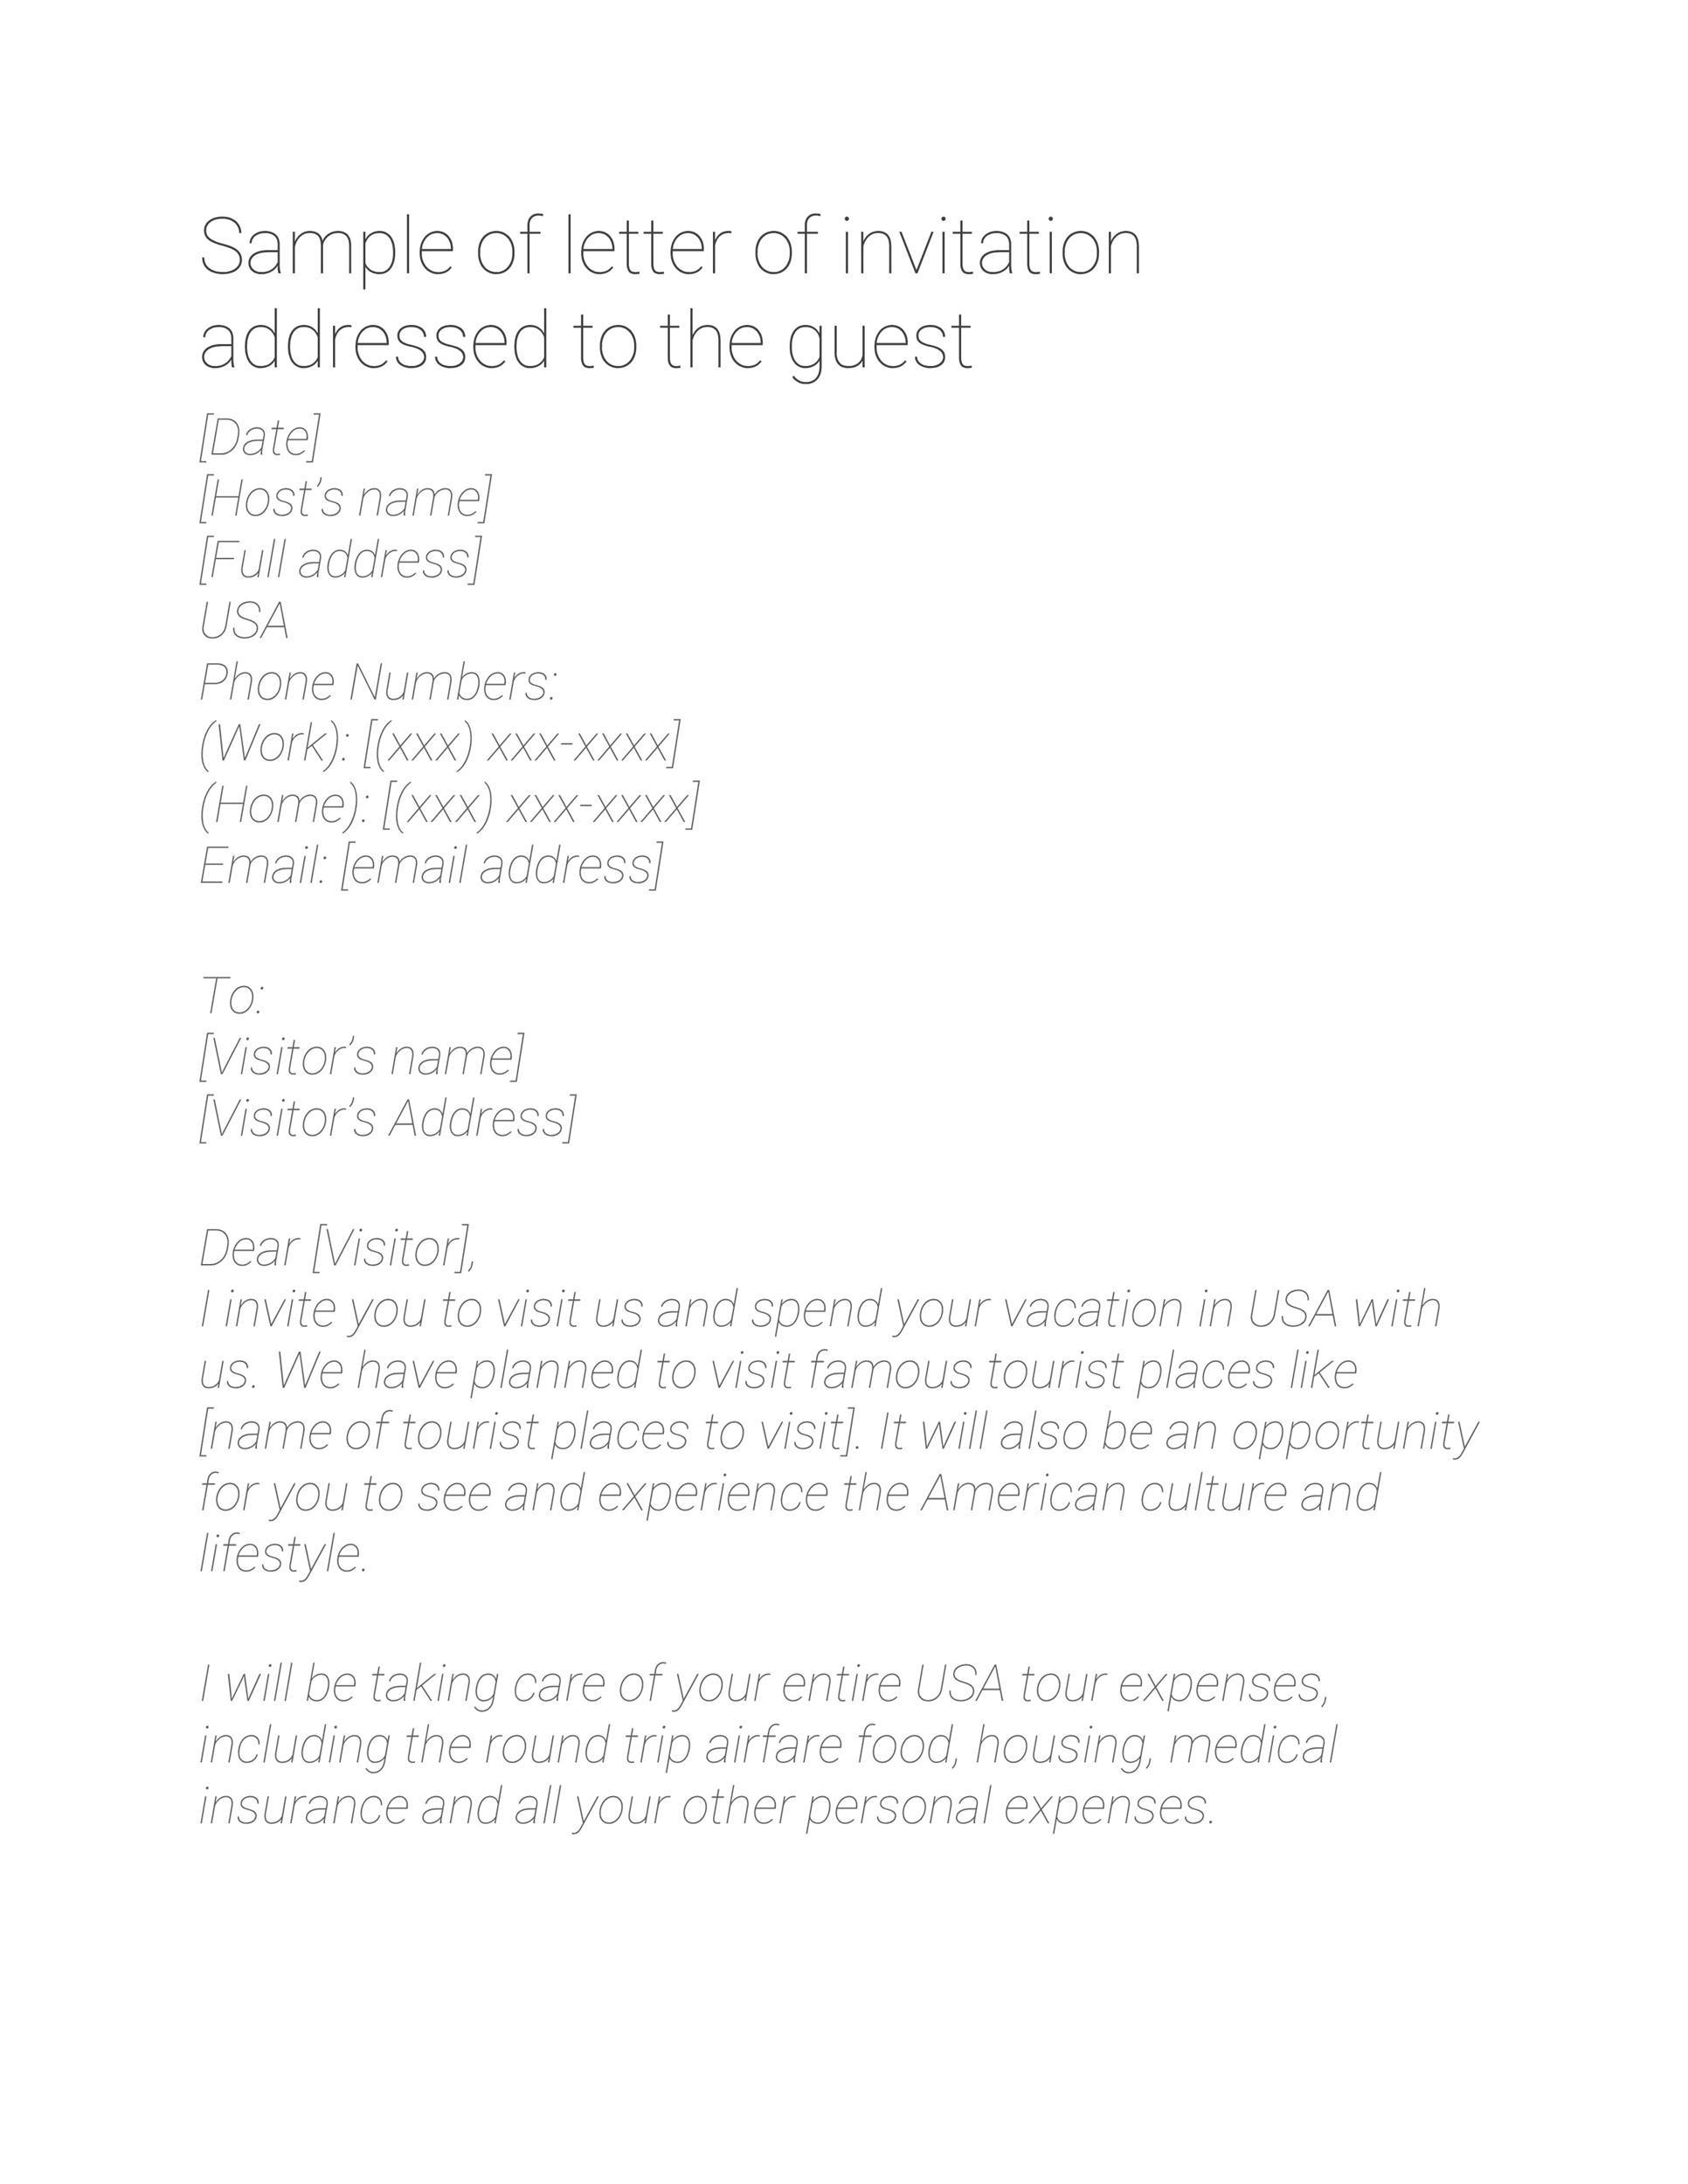 50 Best Invitation Letters (for Visa & General) ᐅ TemplateLab